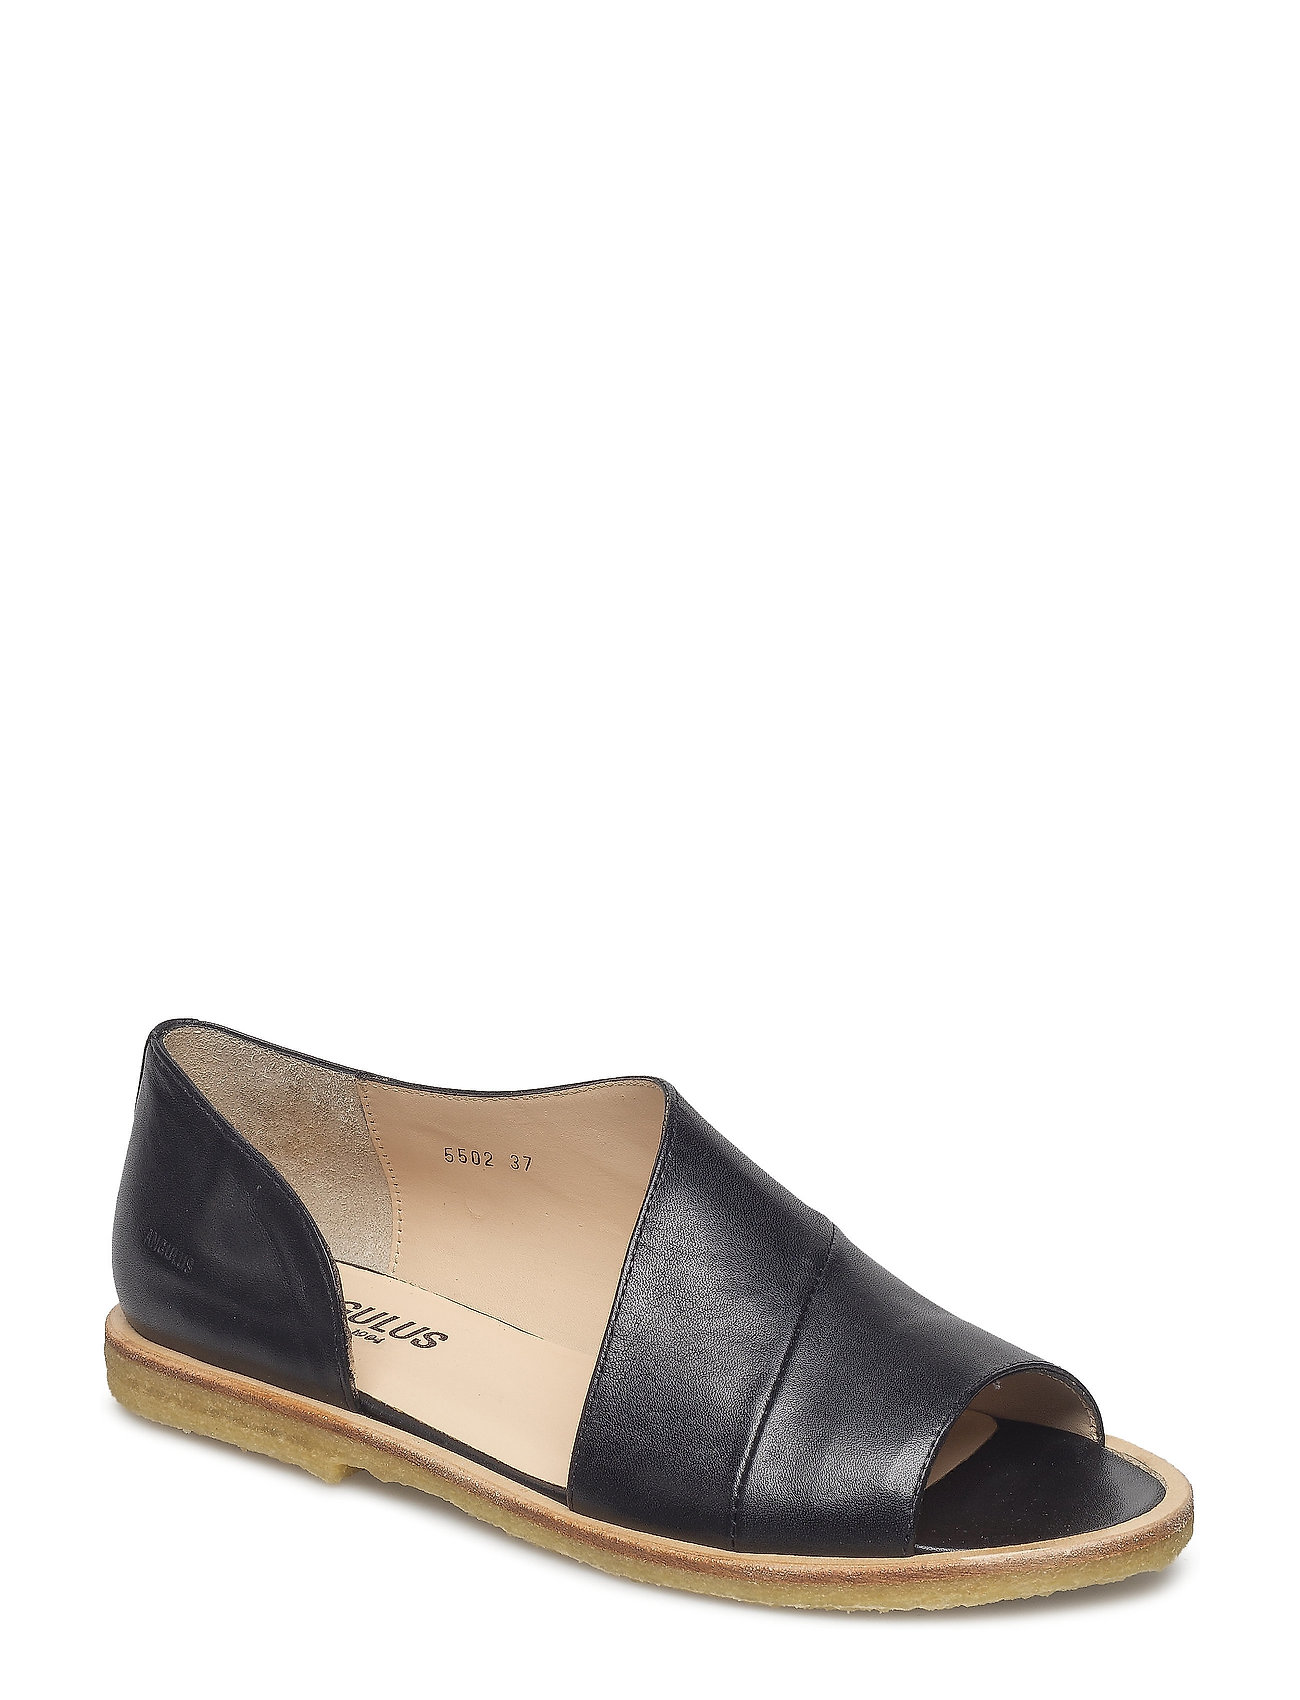 9ae4274656c ANGULUS Sandals - Flat - Closed Toe - (1604 Black), (85 €) | Large ...